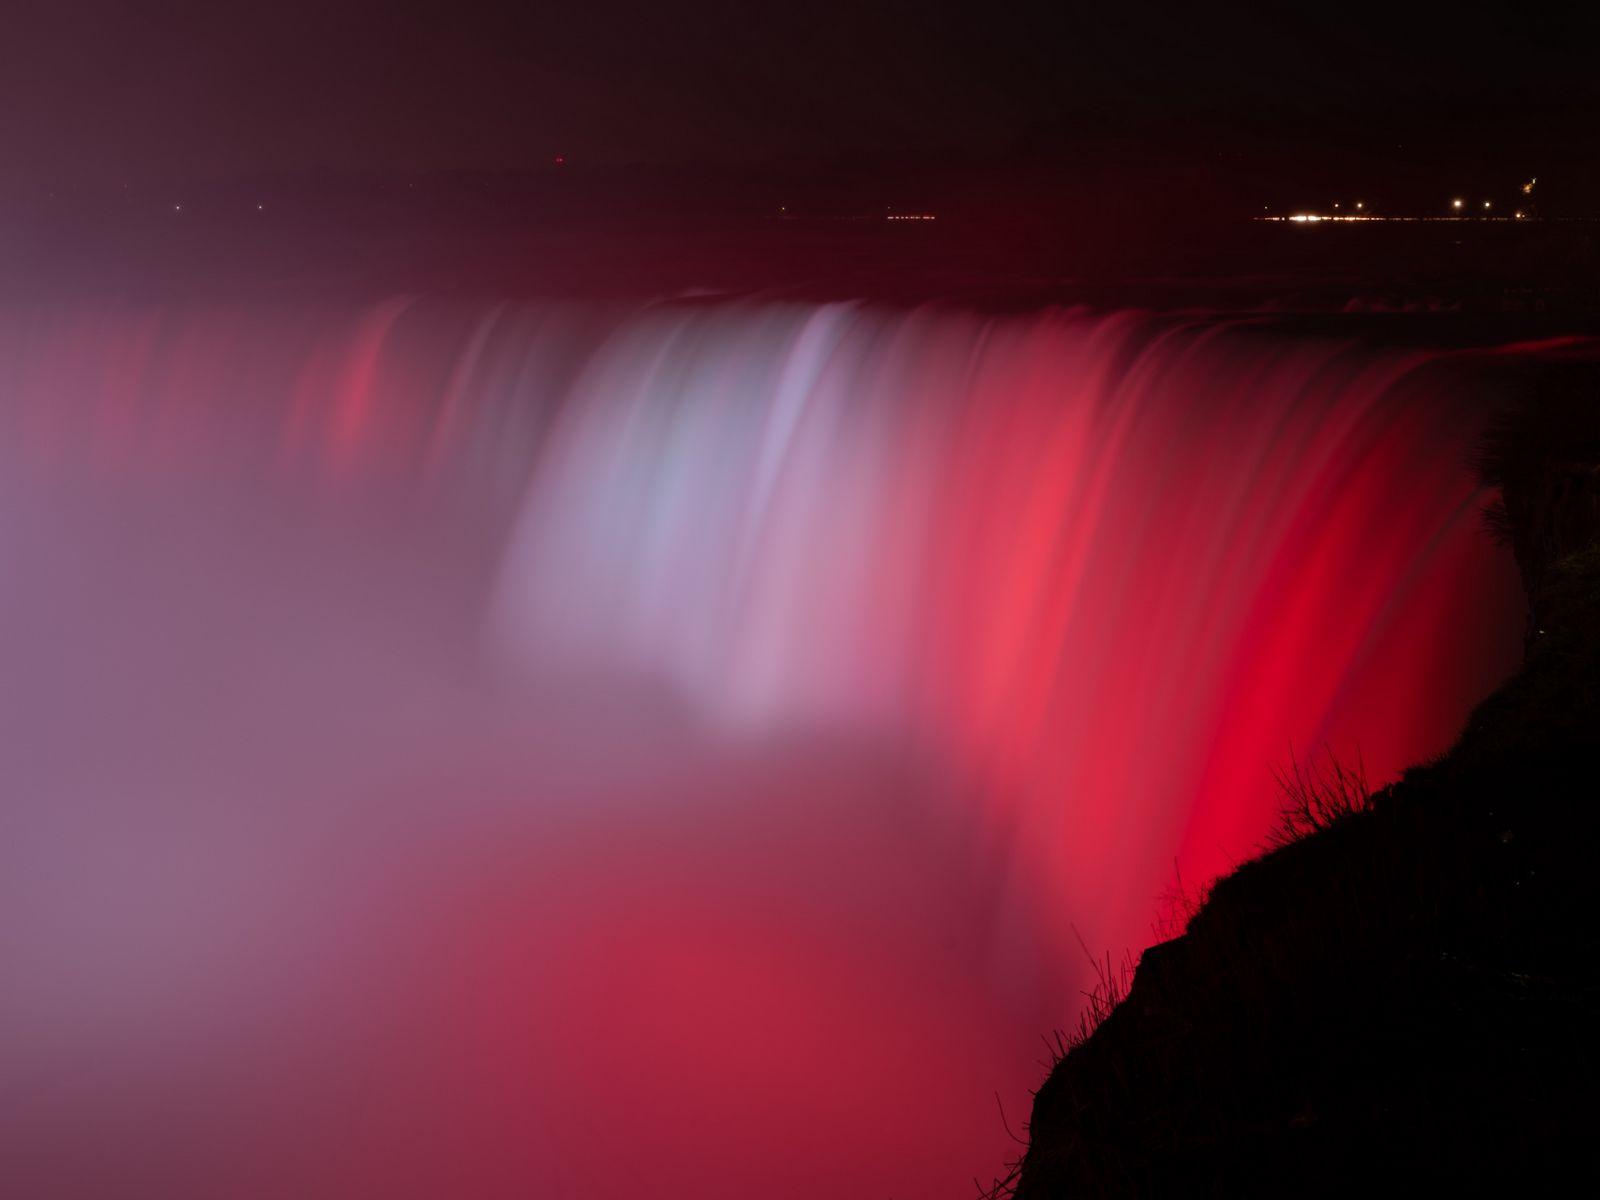 1600x1200 Wallpaper waterfall, fog, backlight, red, dark